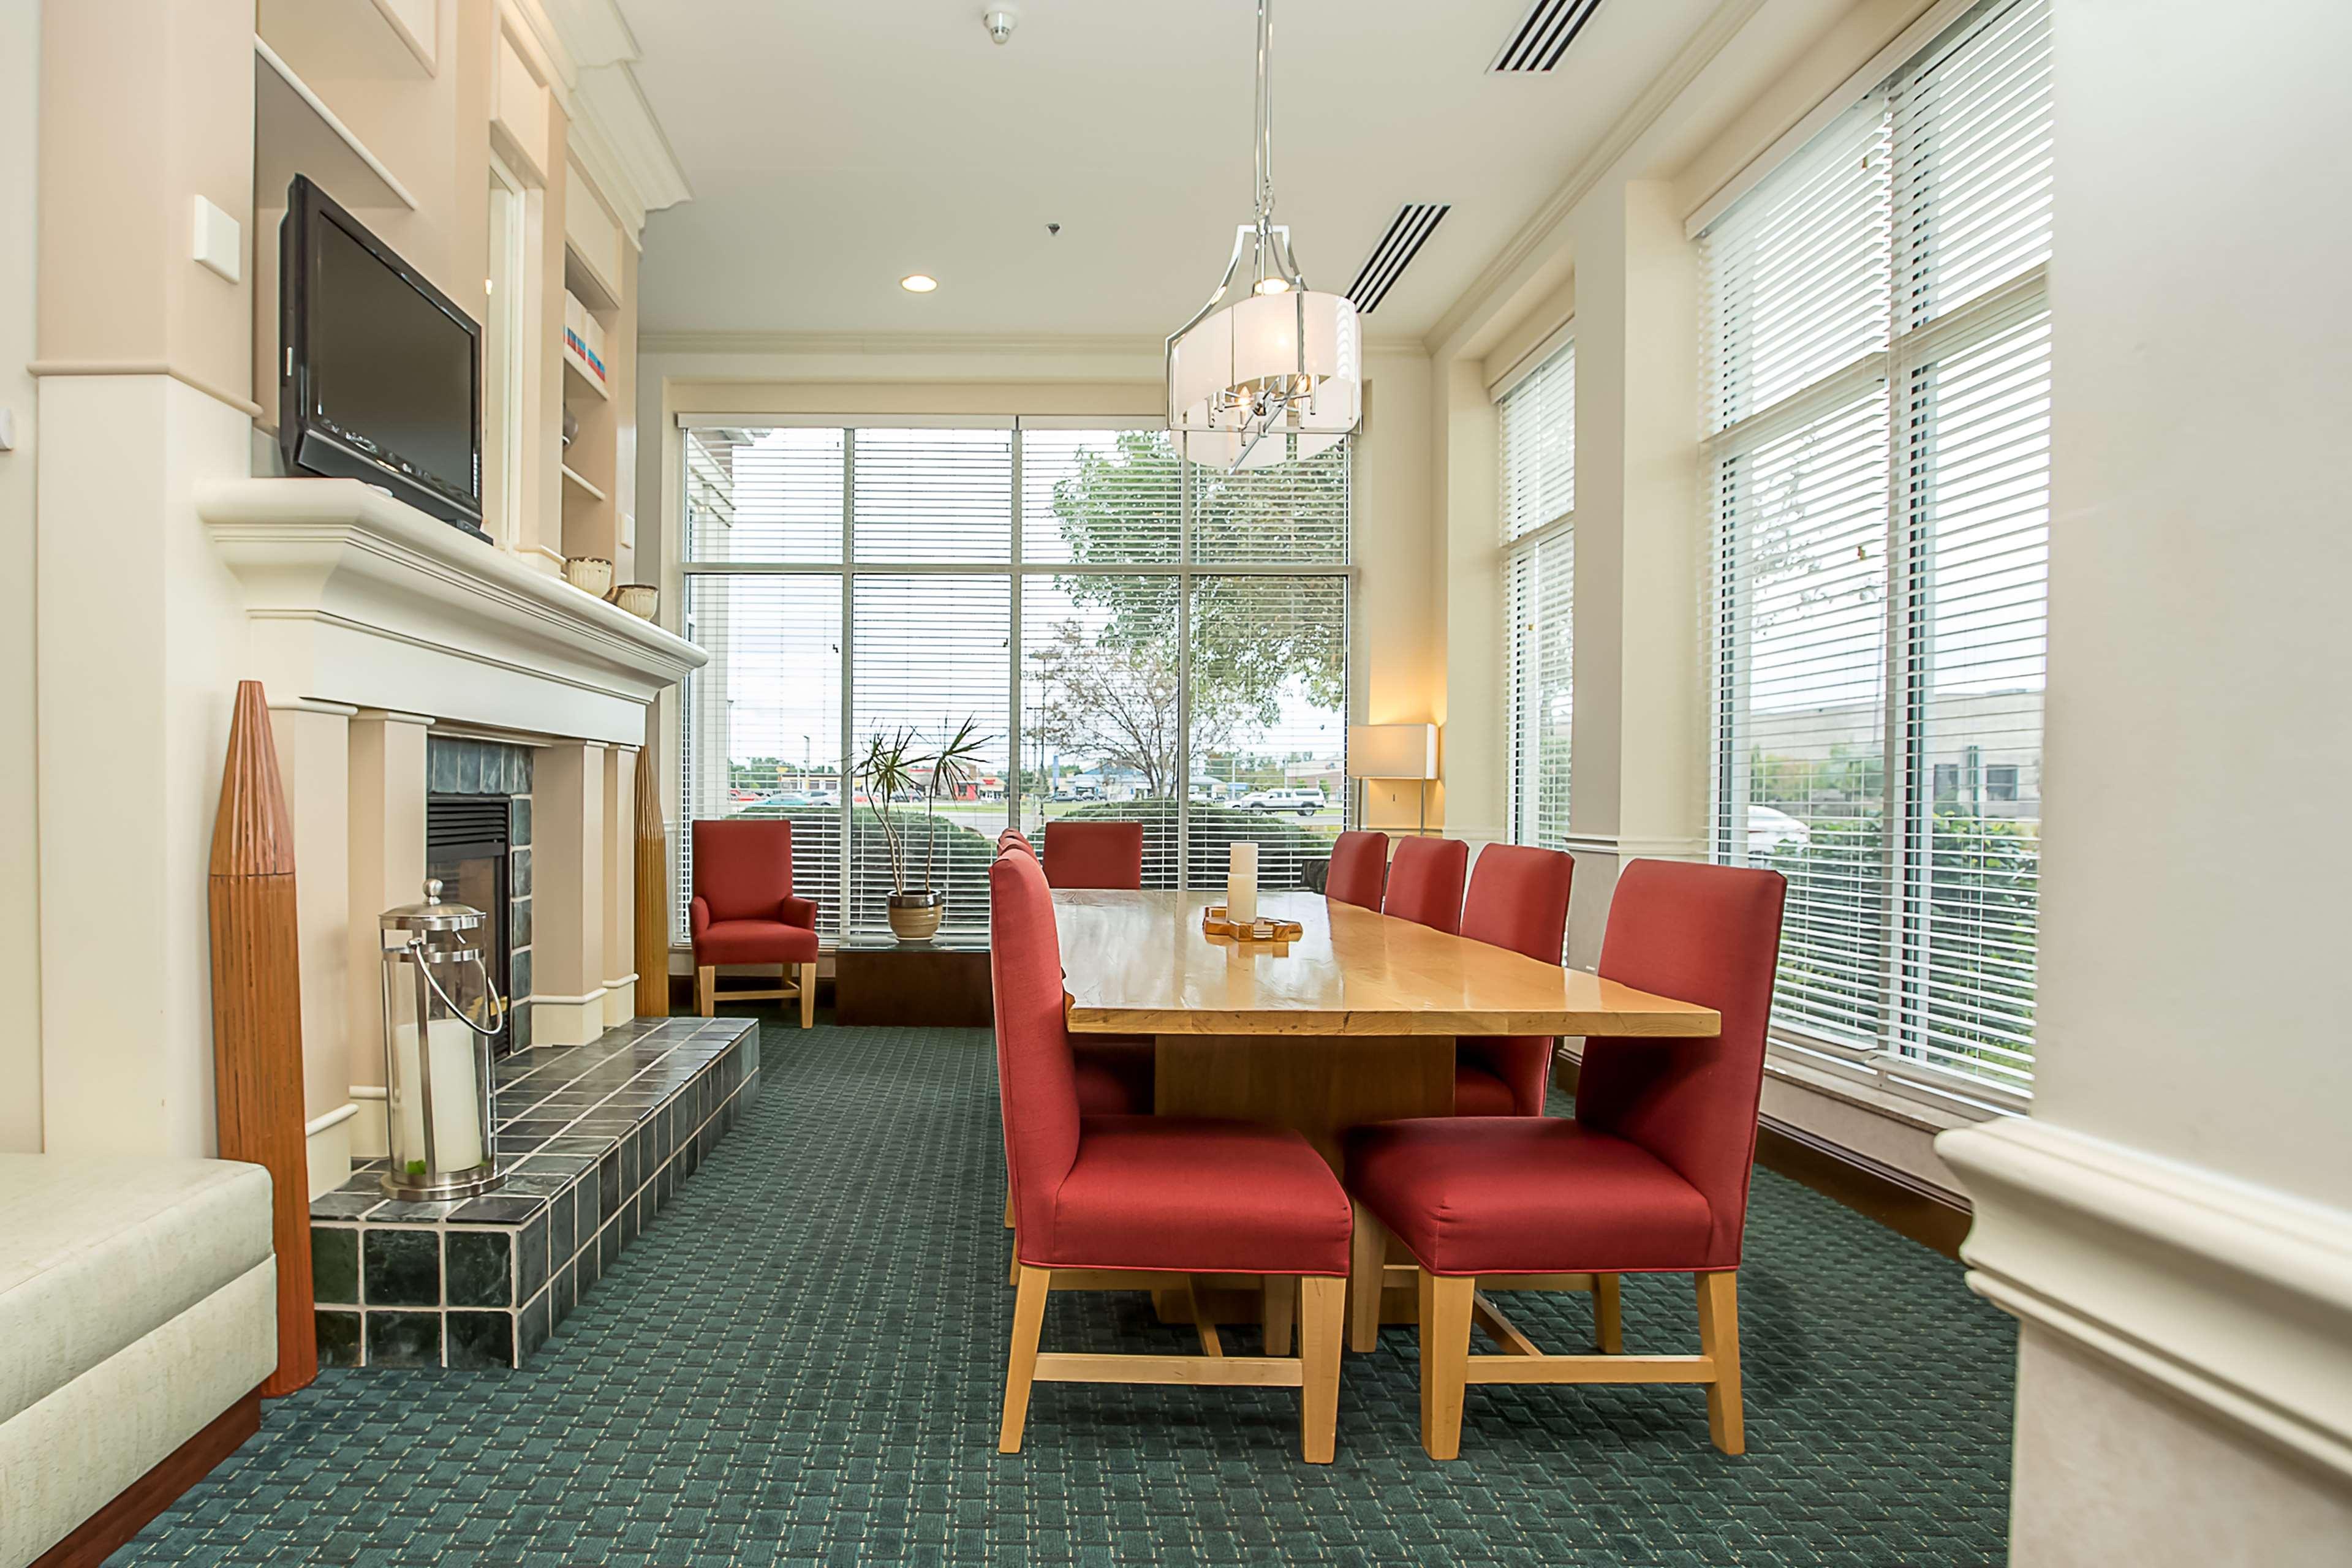 Hilton Garden Inn Appleton/Kimberly image 7